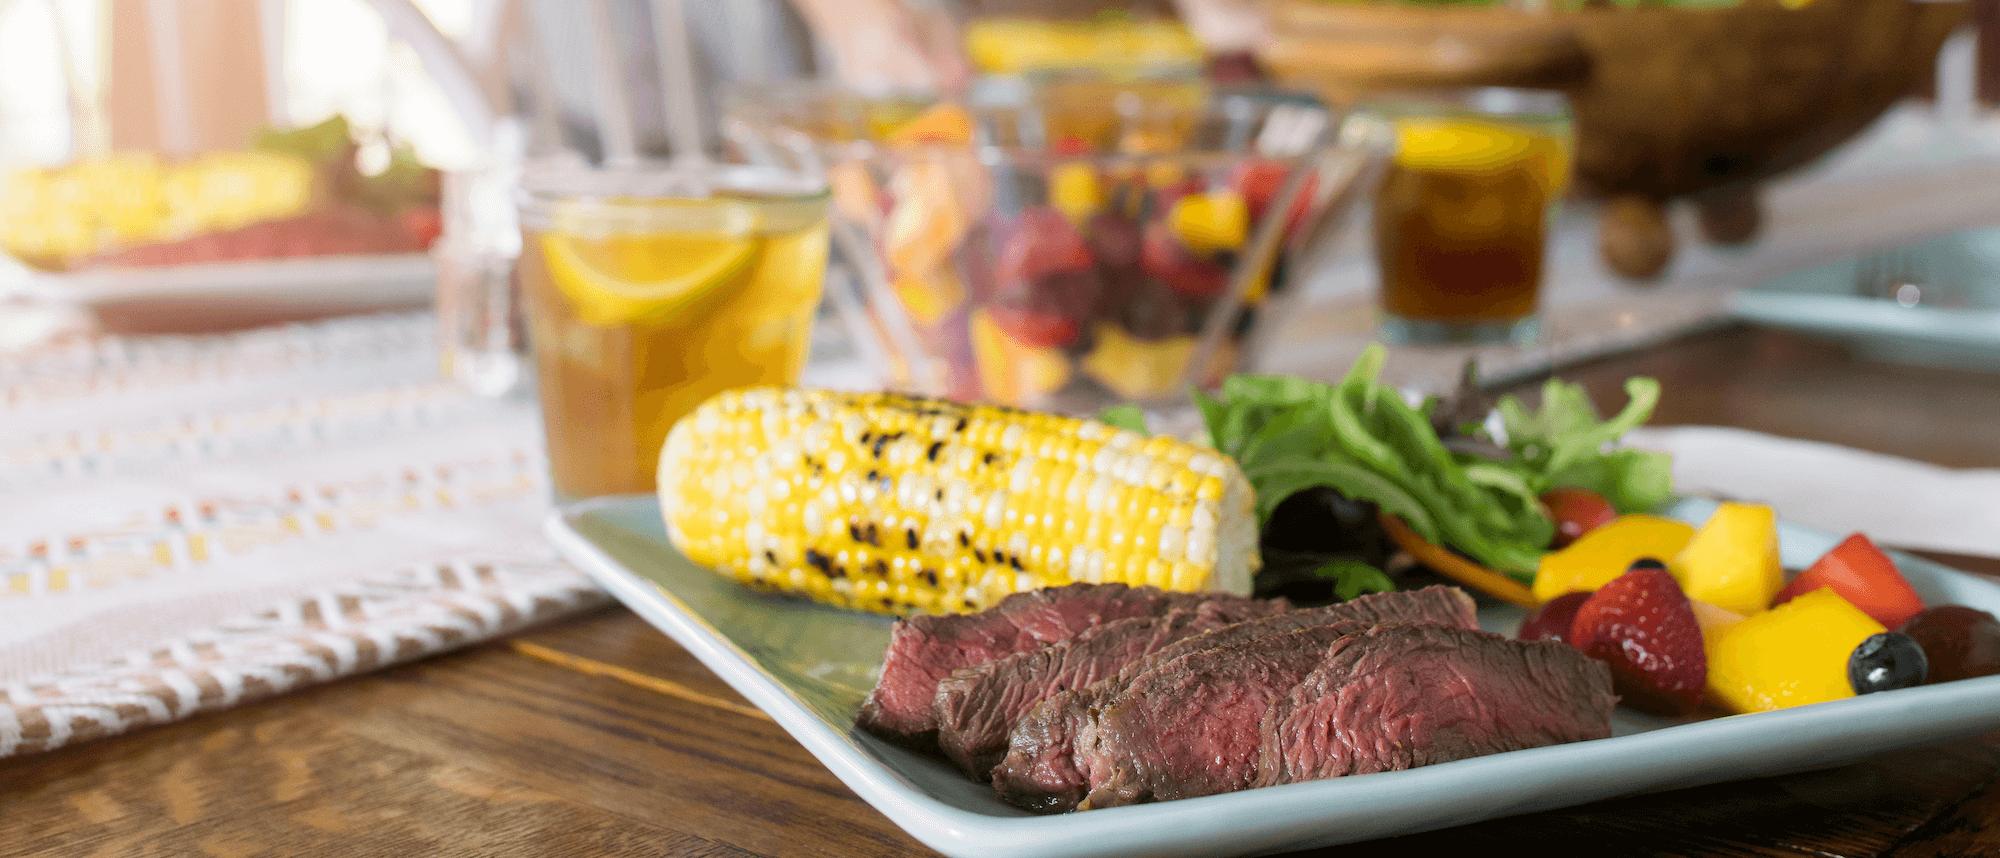 Steak and corn plate